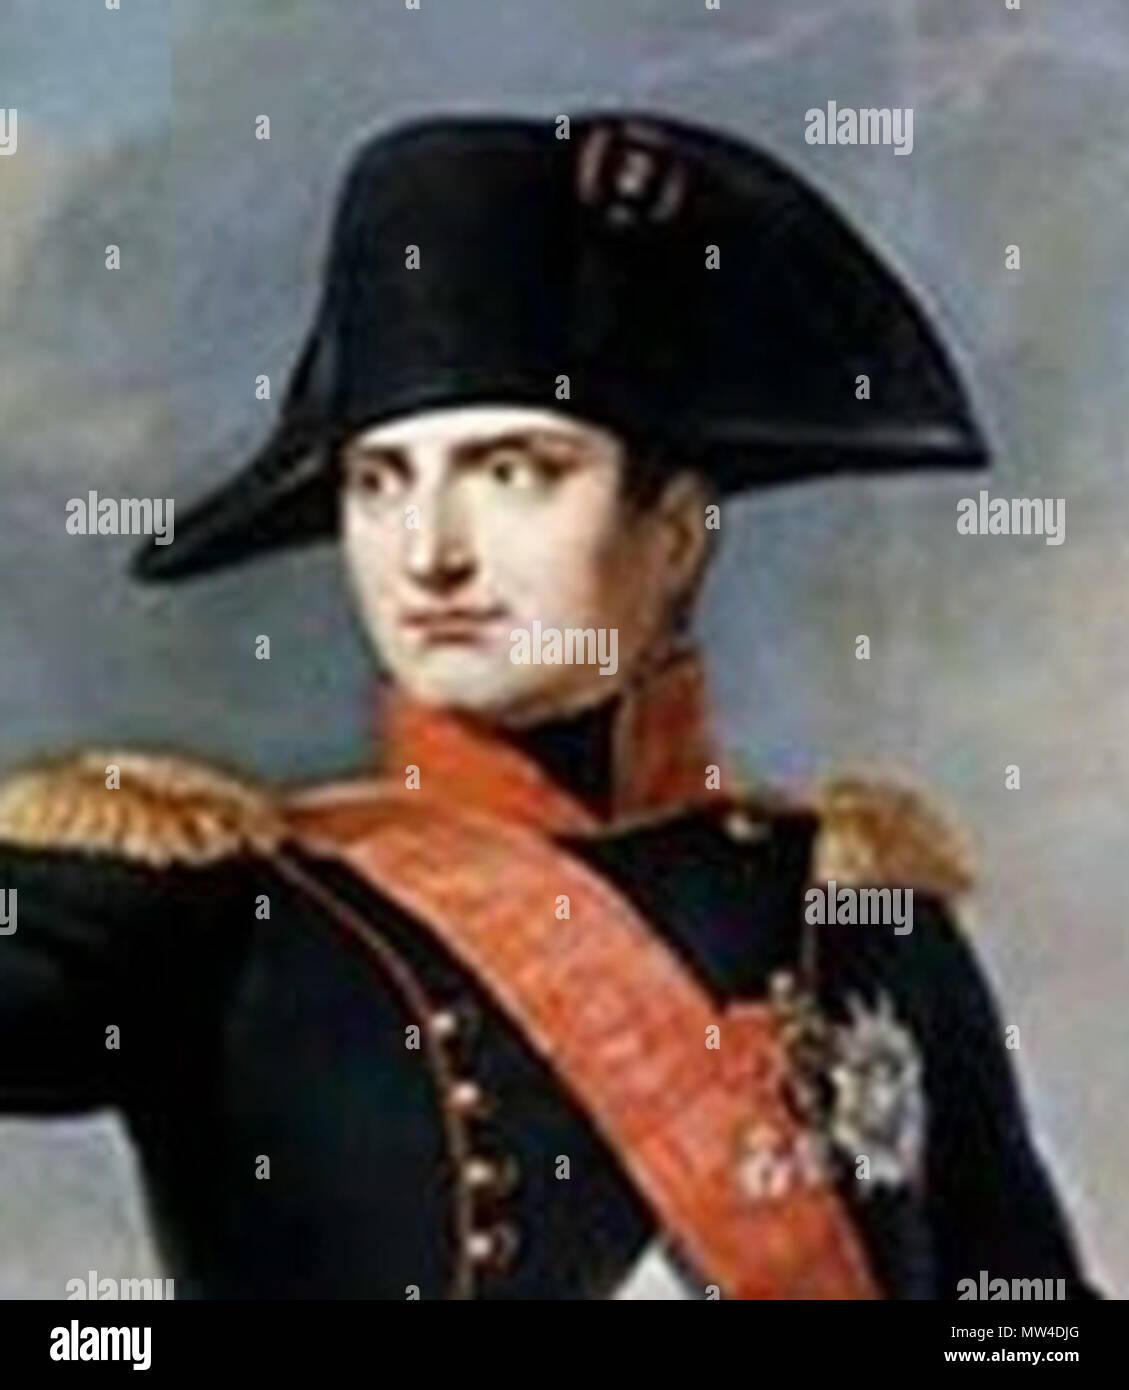 Englisch: Napoleon Bonaparte Italiano: L'Imperatore Napoleone ICH. 19. 352  L'Imperatore Napoleone Stockfotografie - Alamy